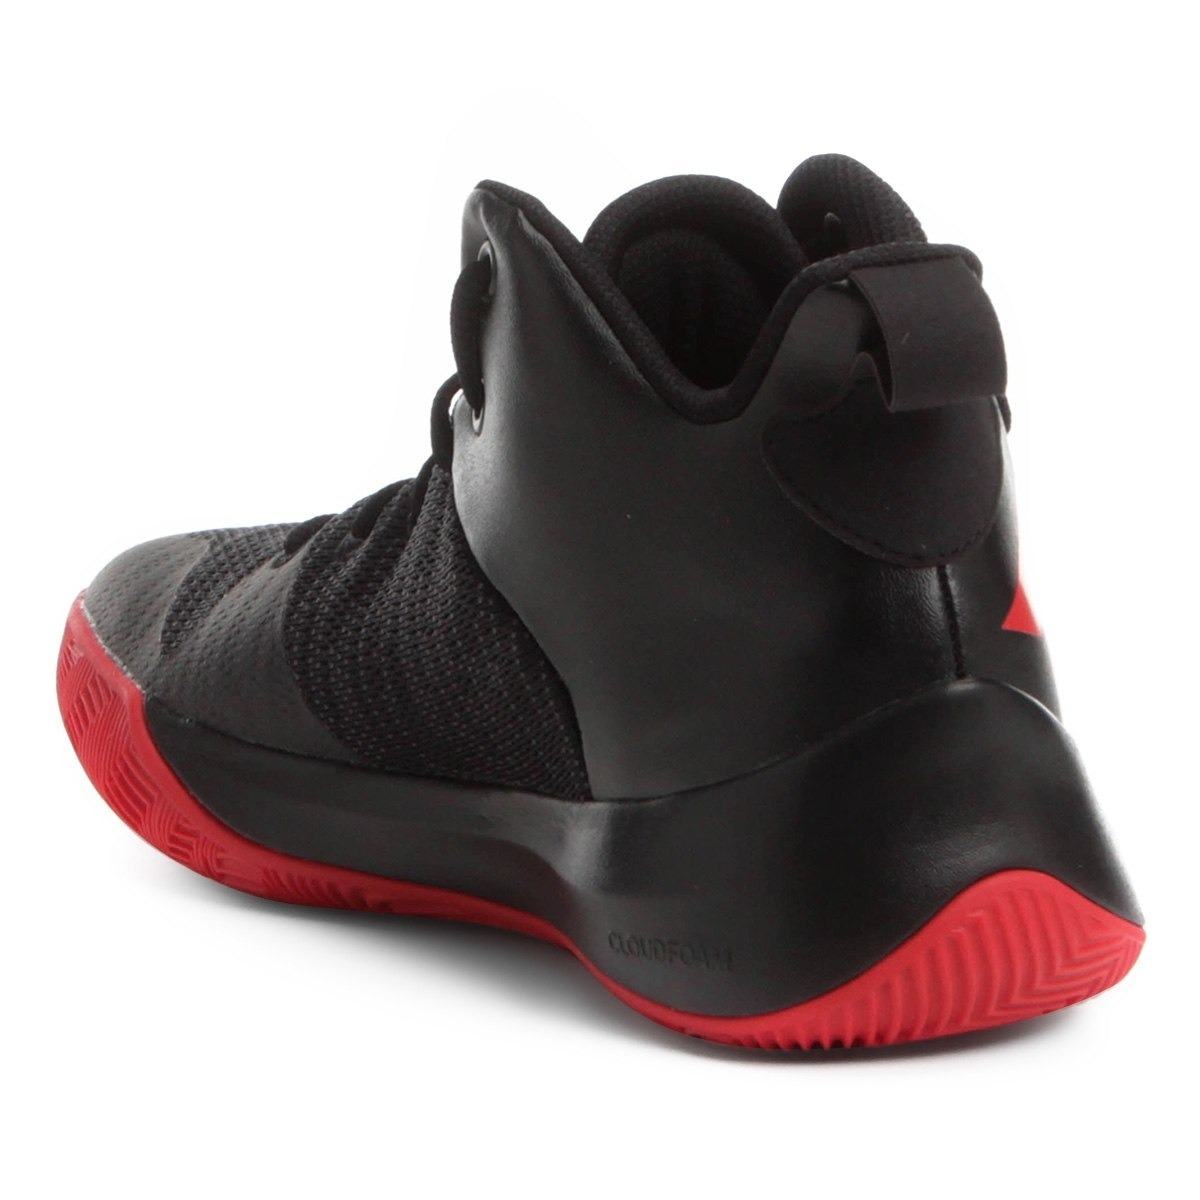 4646c62f9cf Carregando zoom... tênis adidas explosive flash masculino - preto vermelho